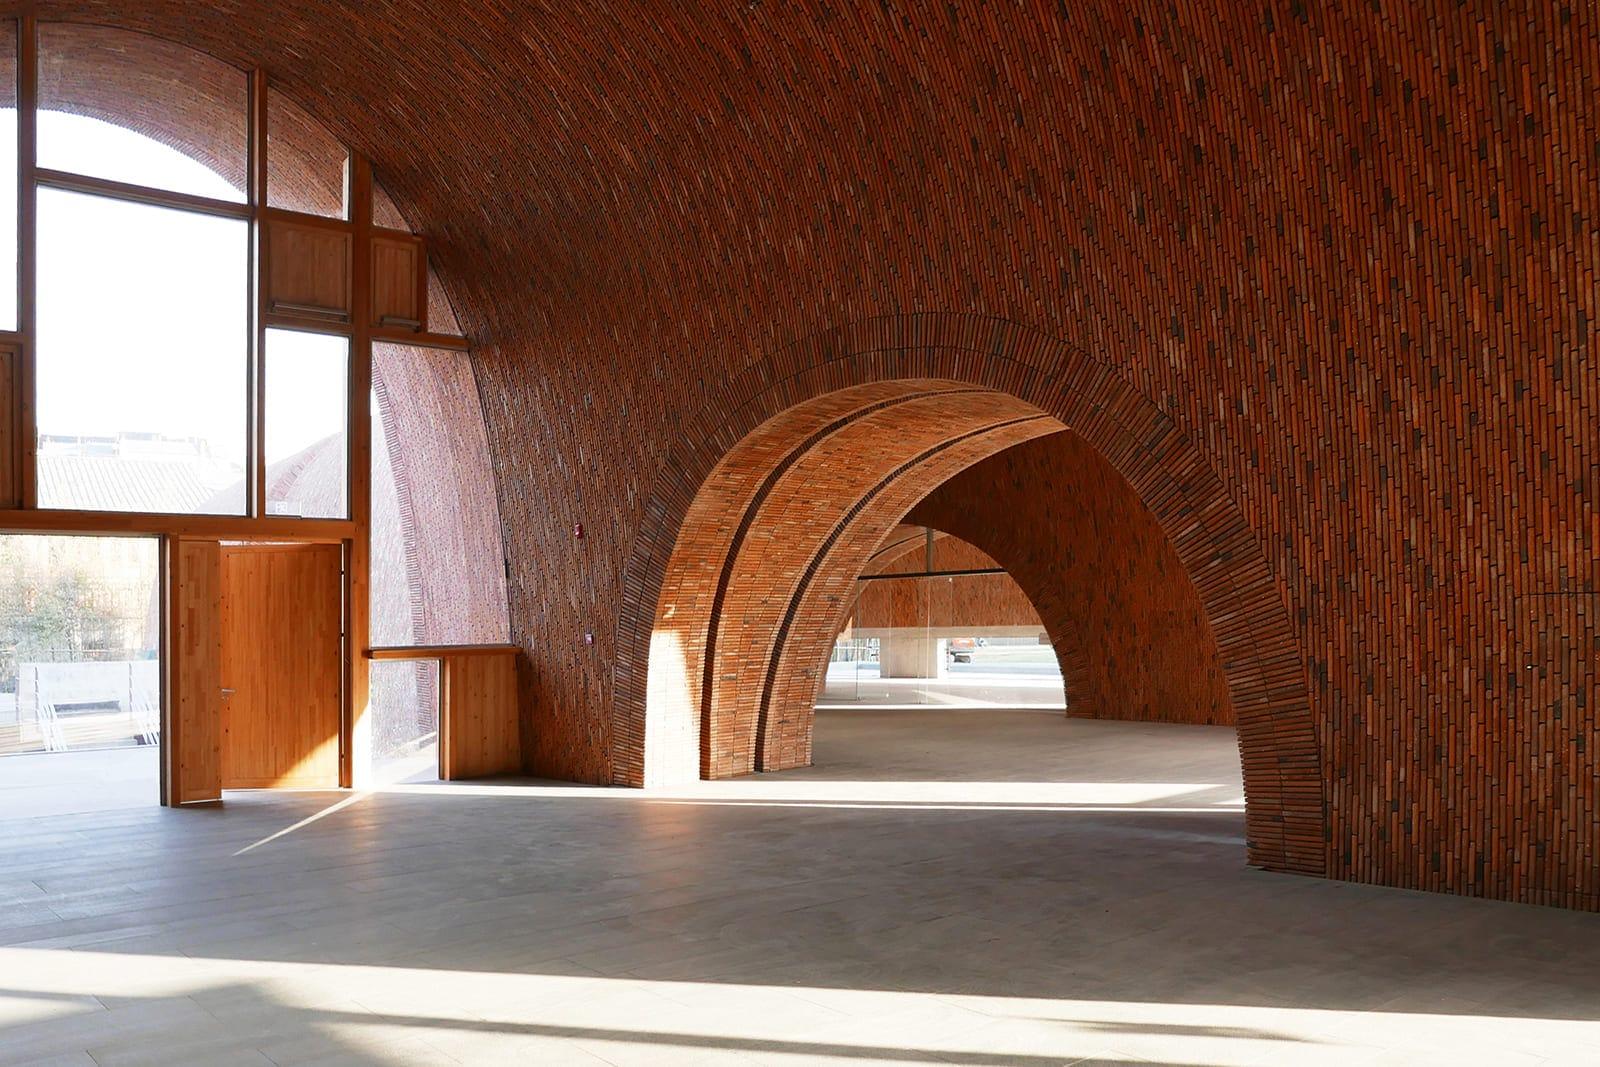 Imperial Kiln Museum in Jingdezhen  - 6.2 ©Studio Zhu Pei 1 47